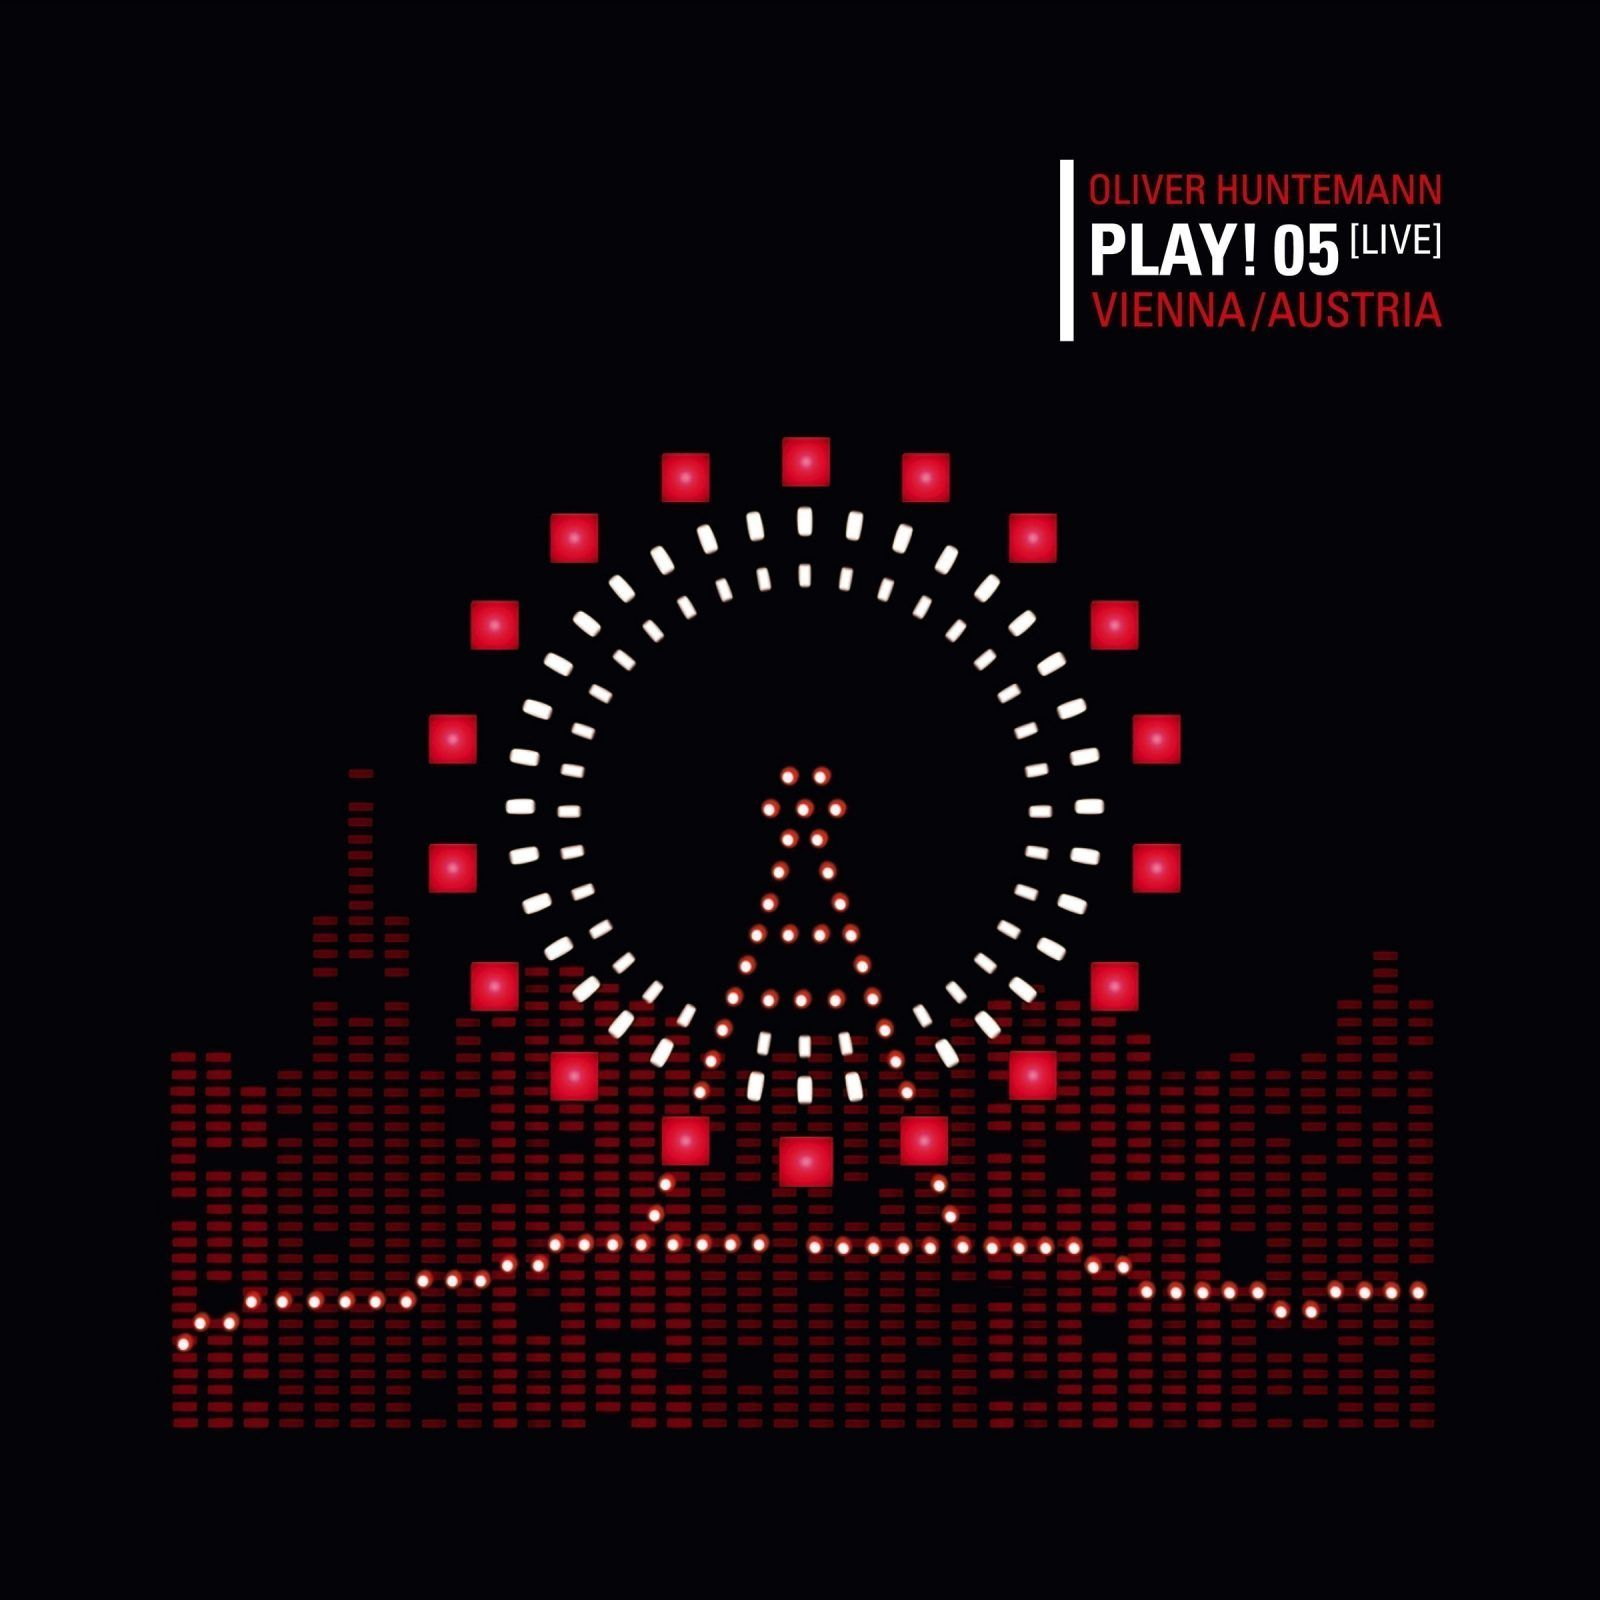 play05.jpg